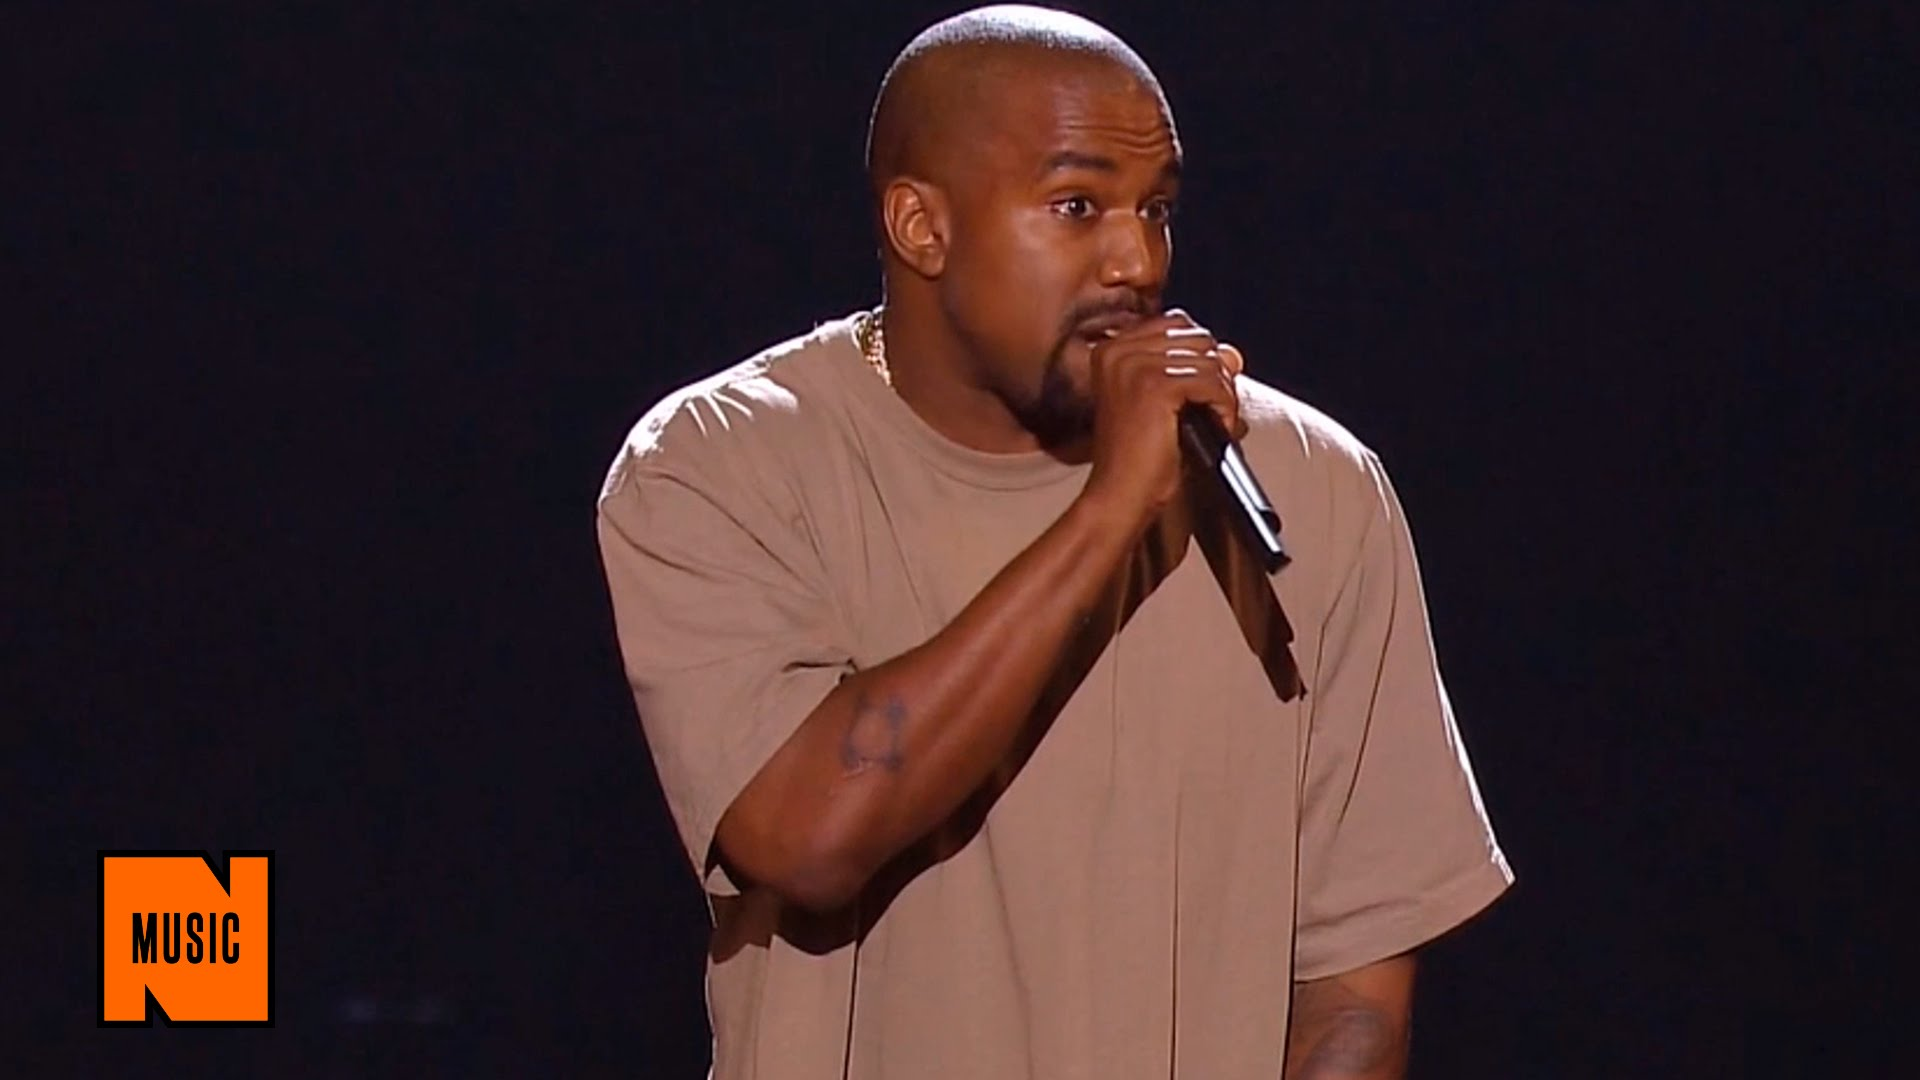 TRUMP: Volim Kanye Westa, dobar je prema meni